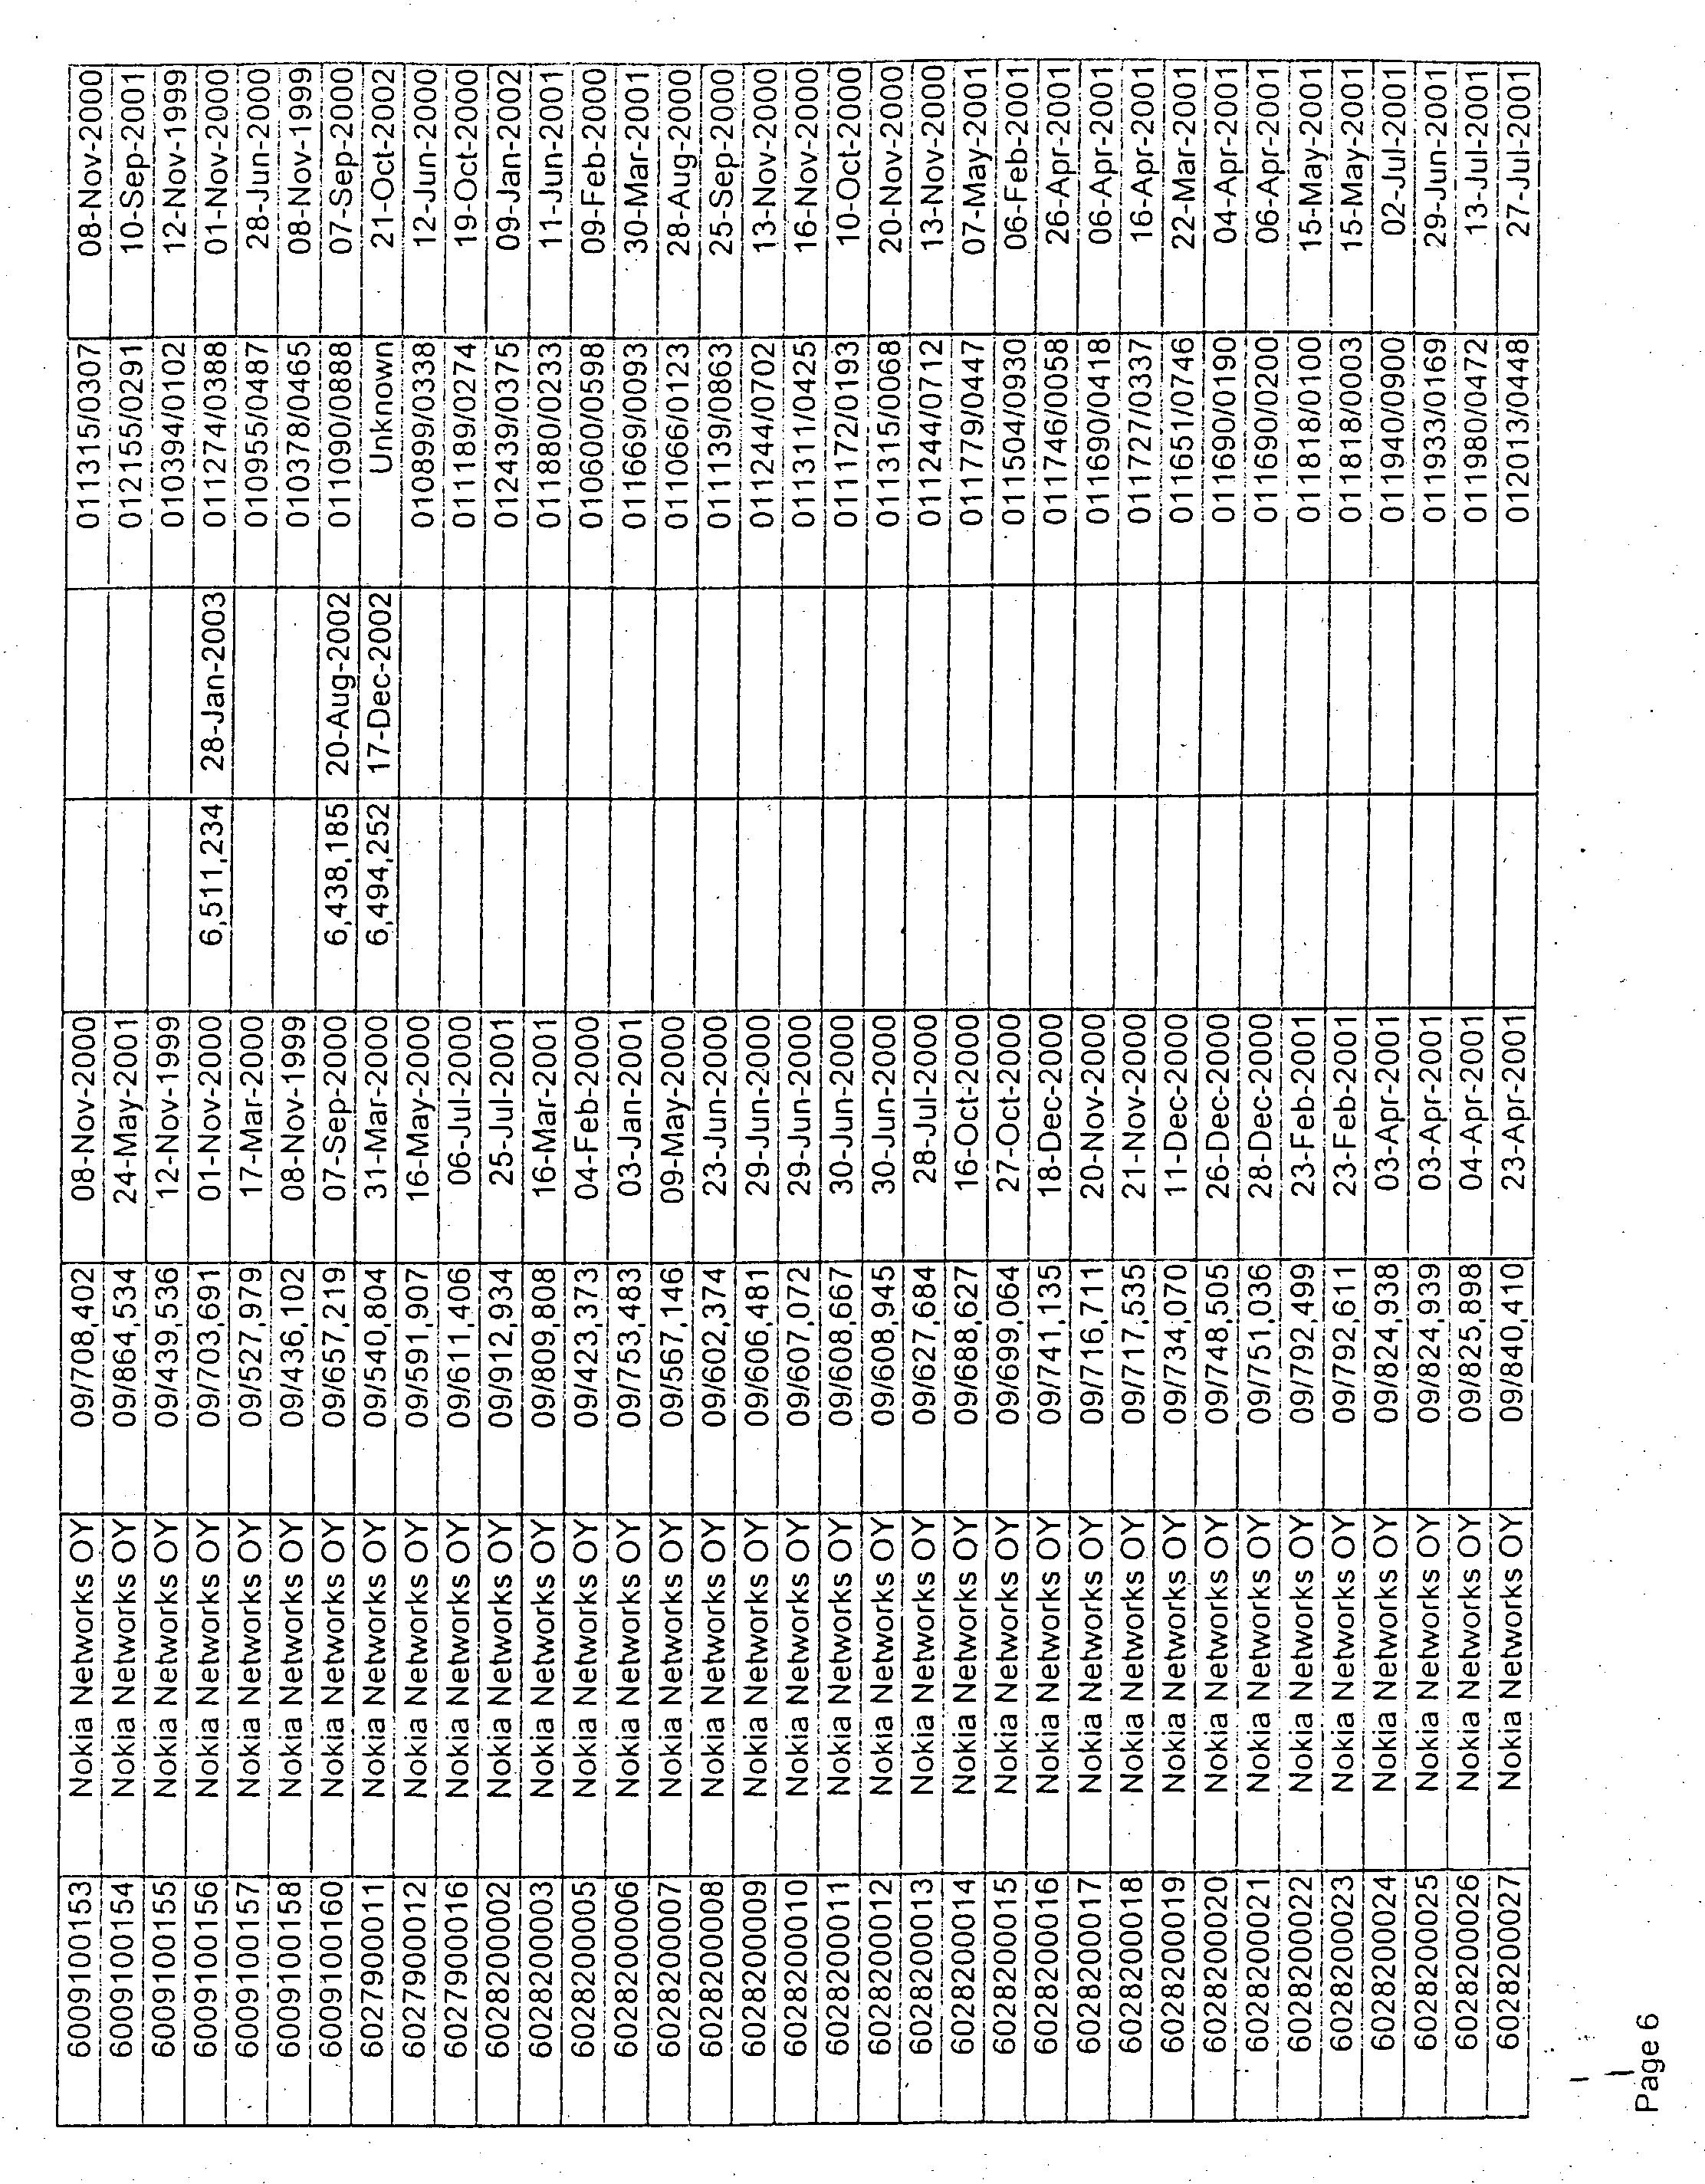 Figure US20030125024A1-20030703-P00006